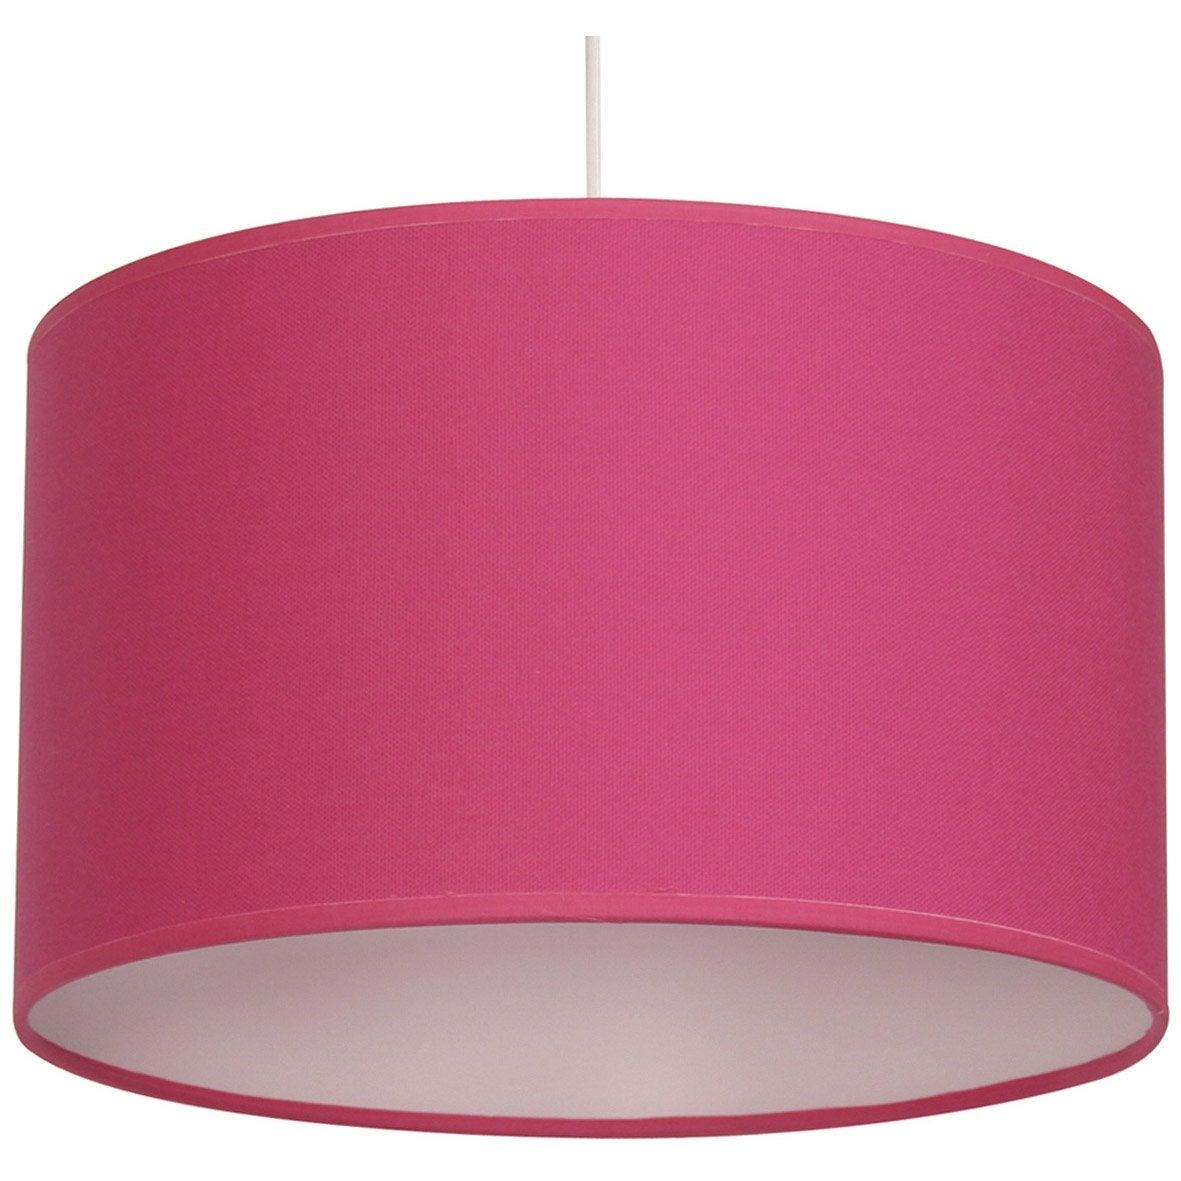 suspension natt coton rose shocking n 3 1 x 60 w inspire leroy merlin. Black Bedroom Furniture Sets. Home Design Ideas